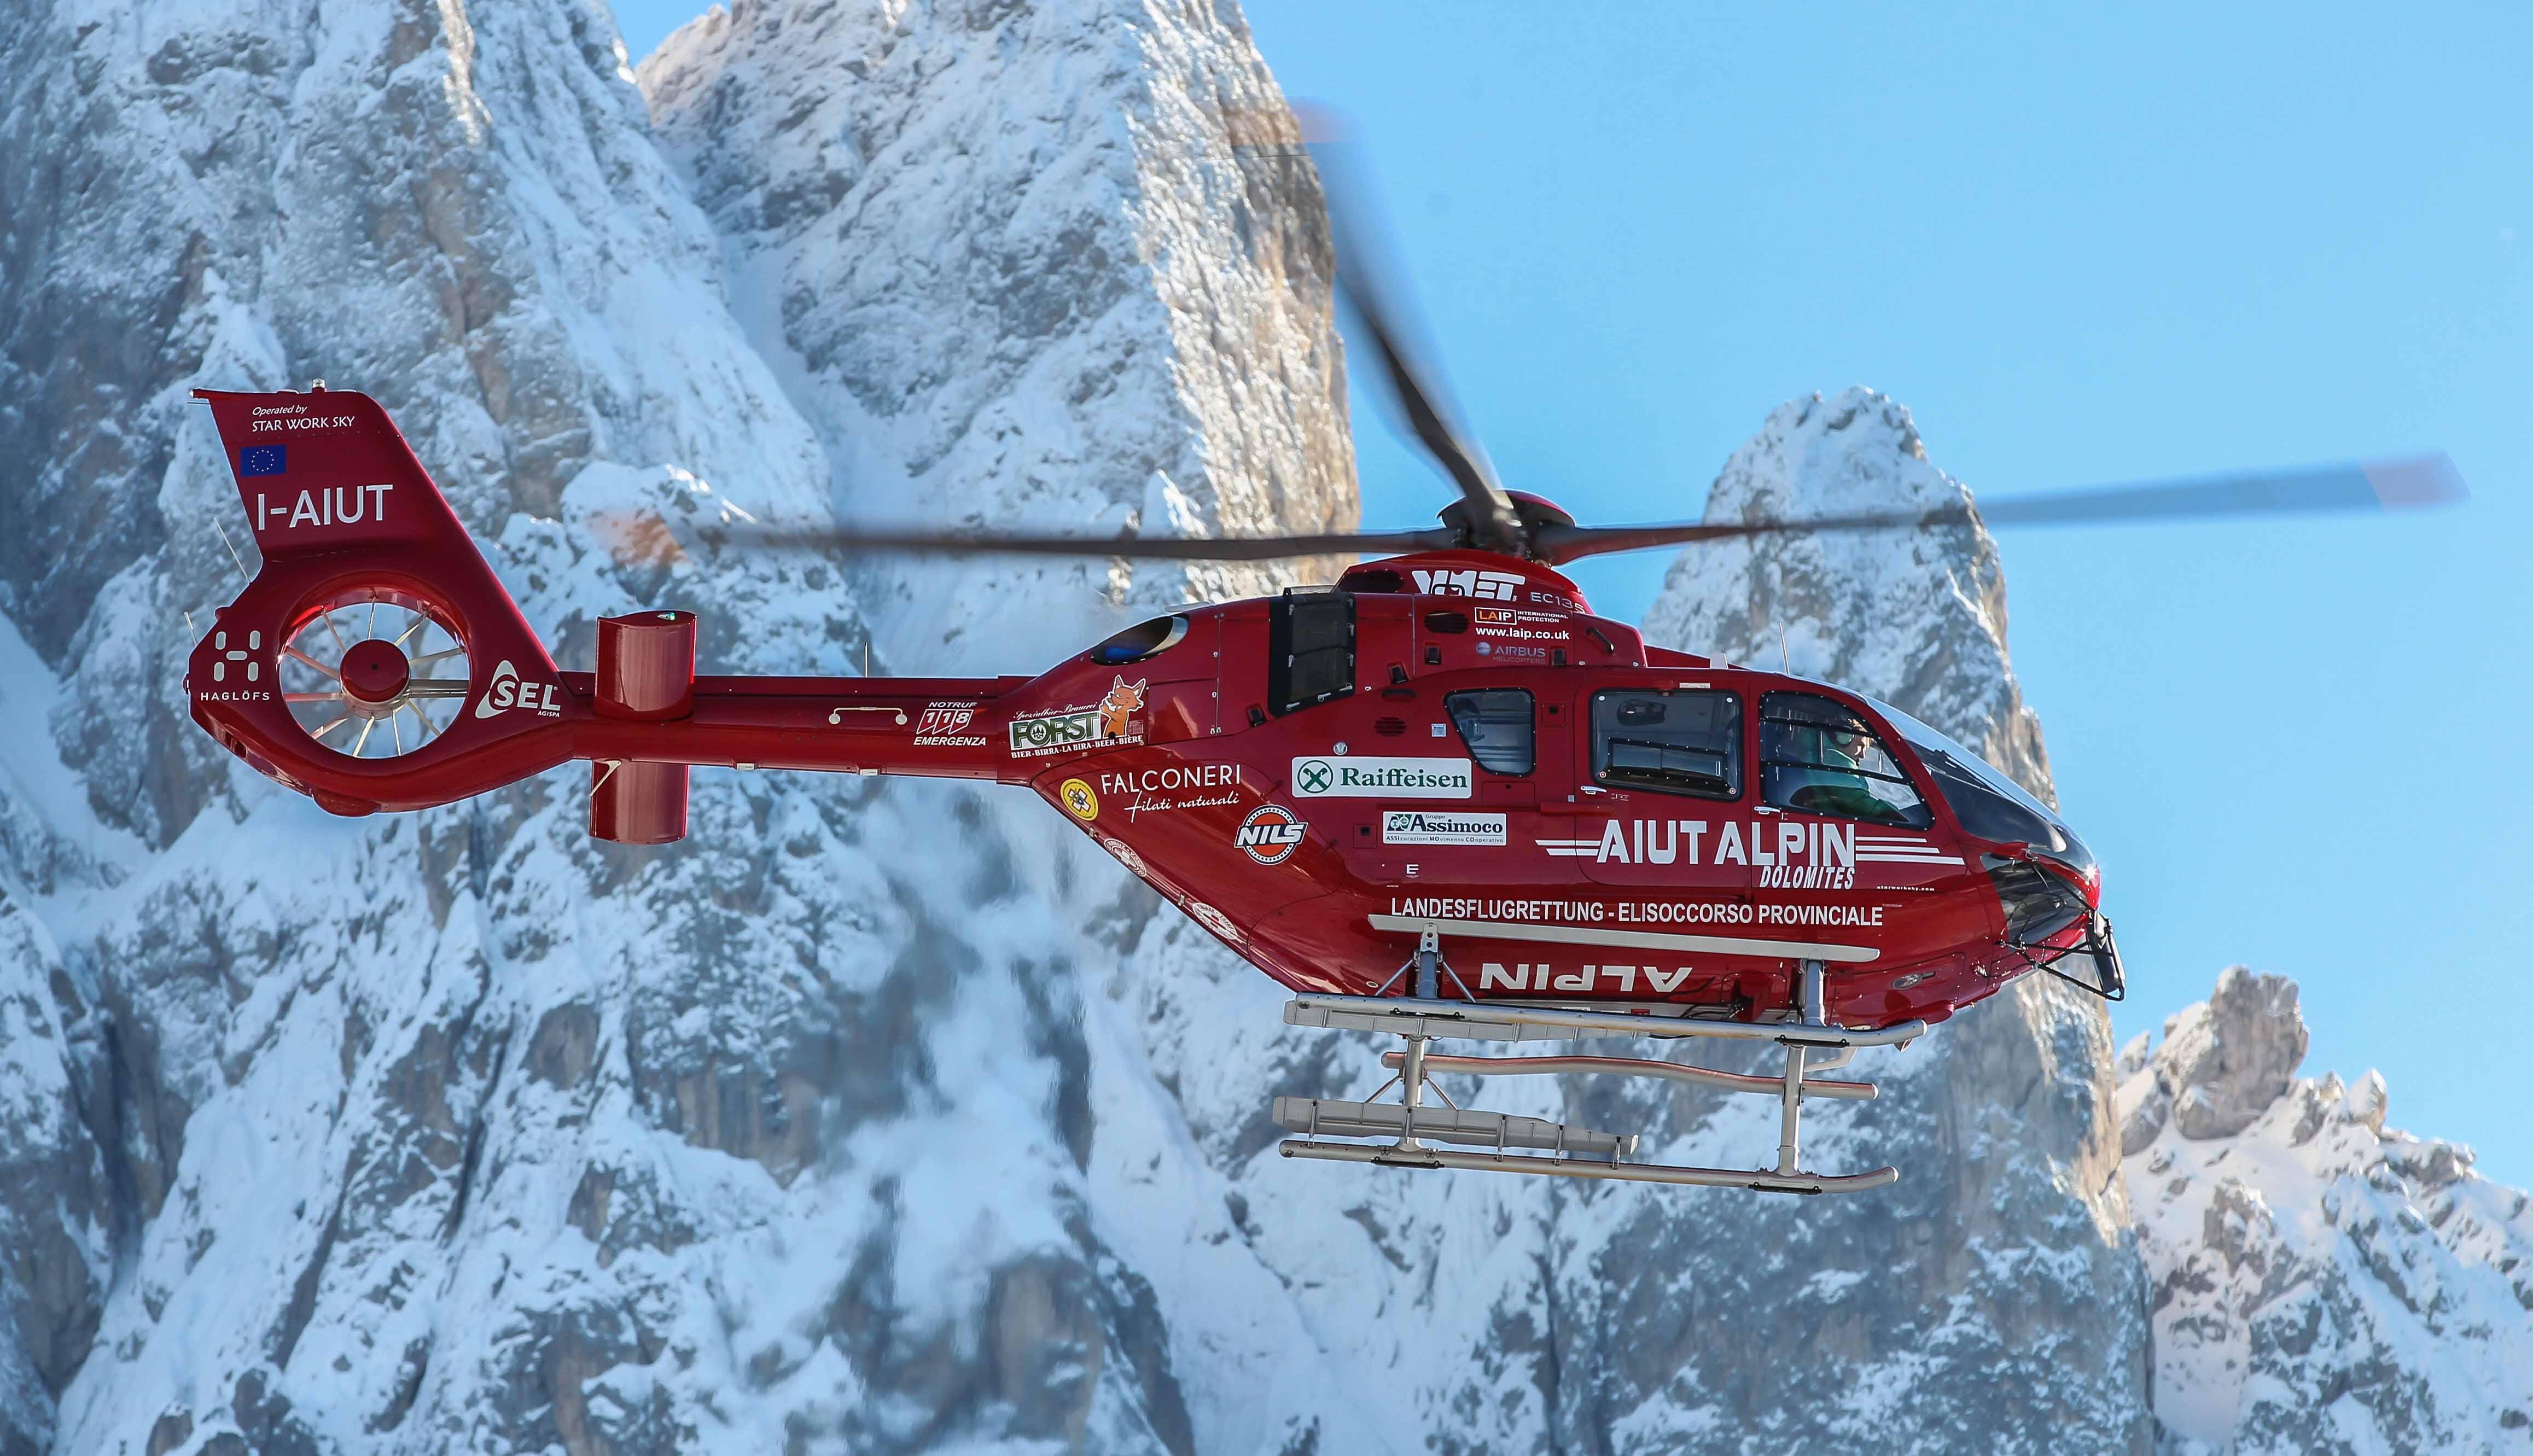 EC135_T2_Aiut_Alpin_Dolomites_Deom-1808_high